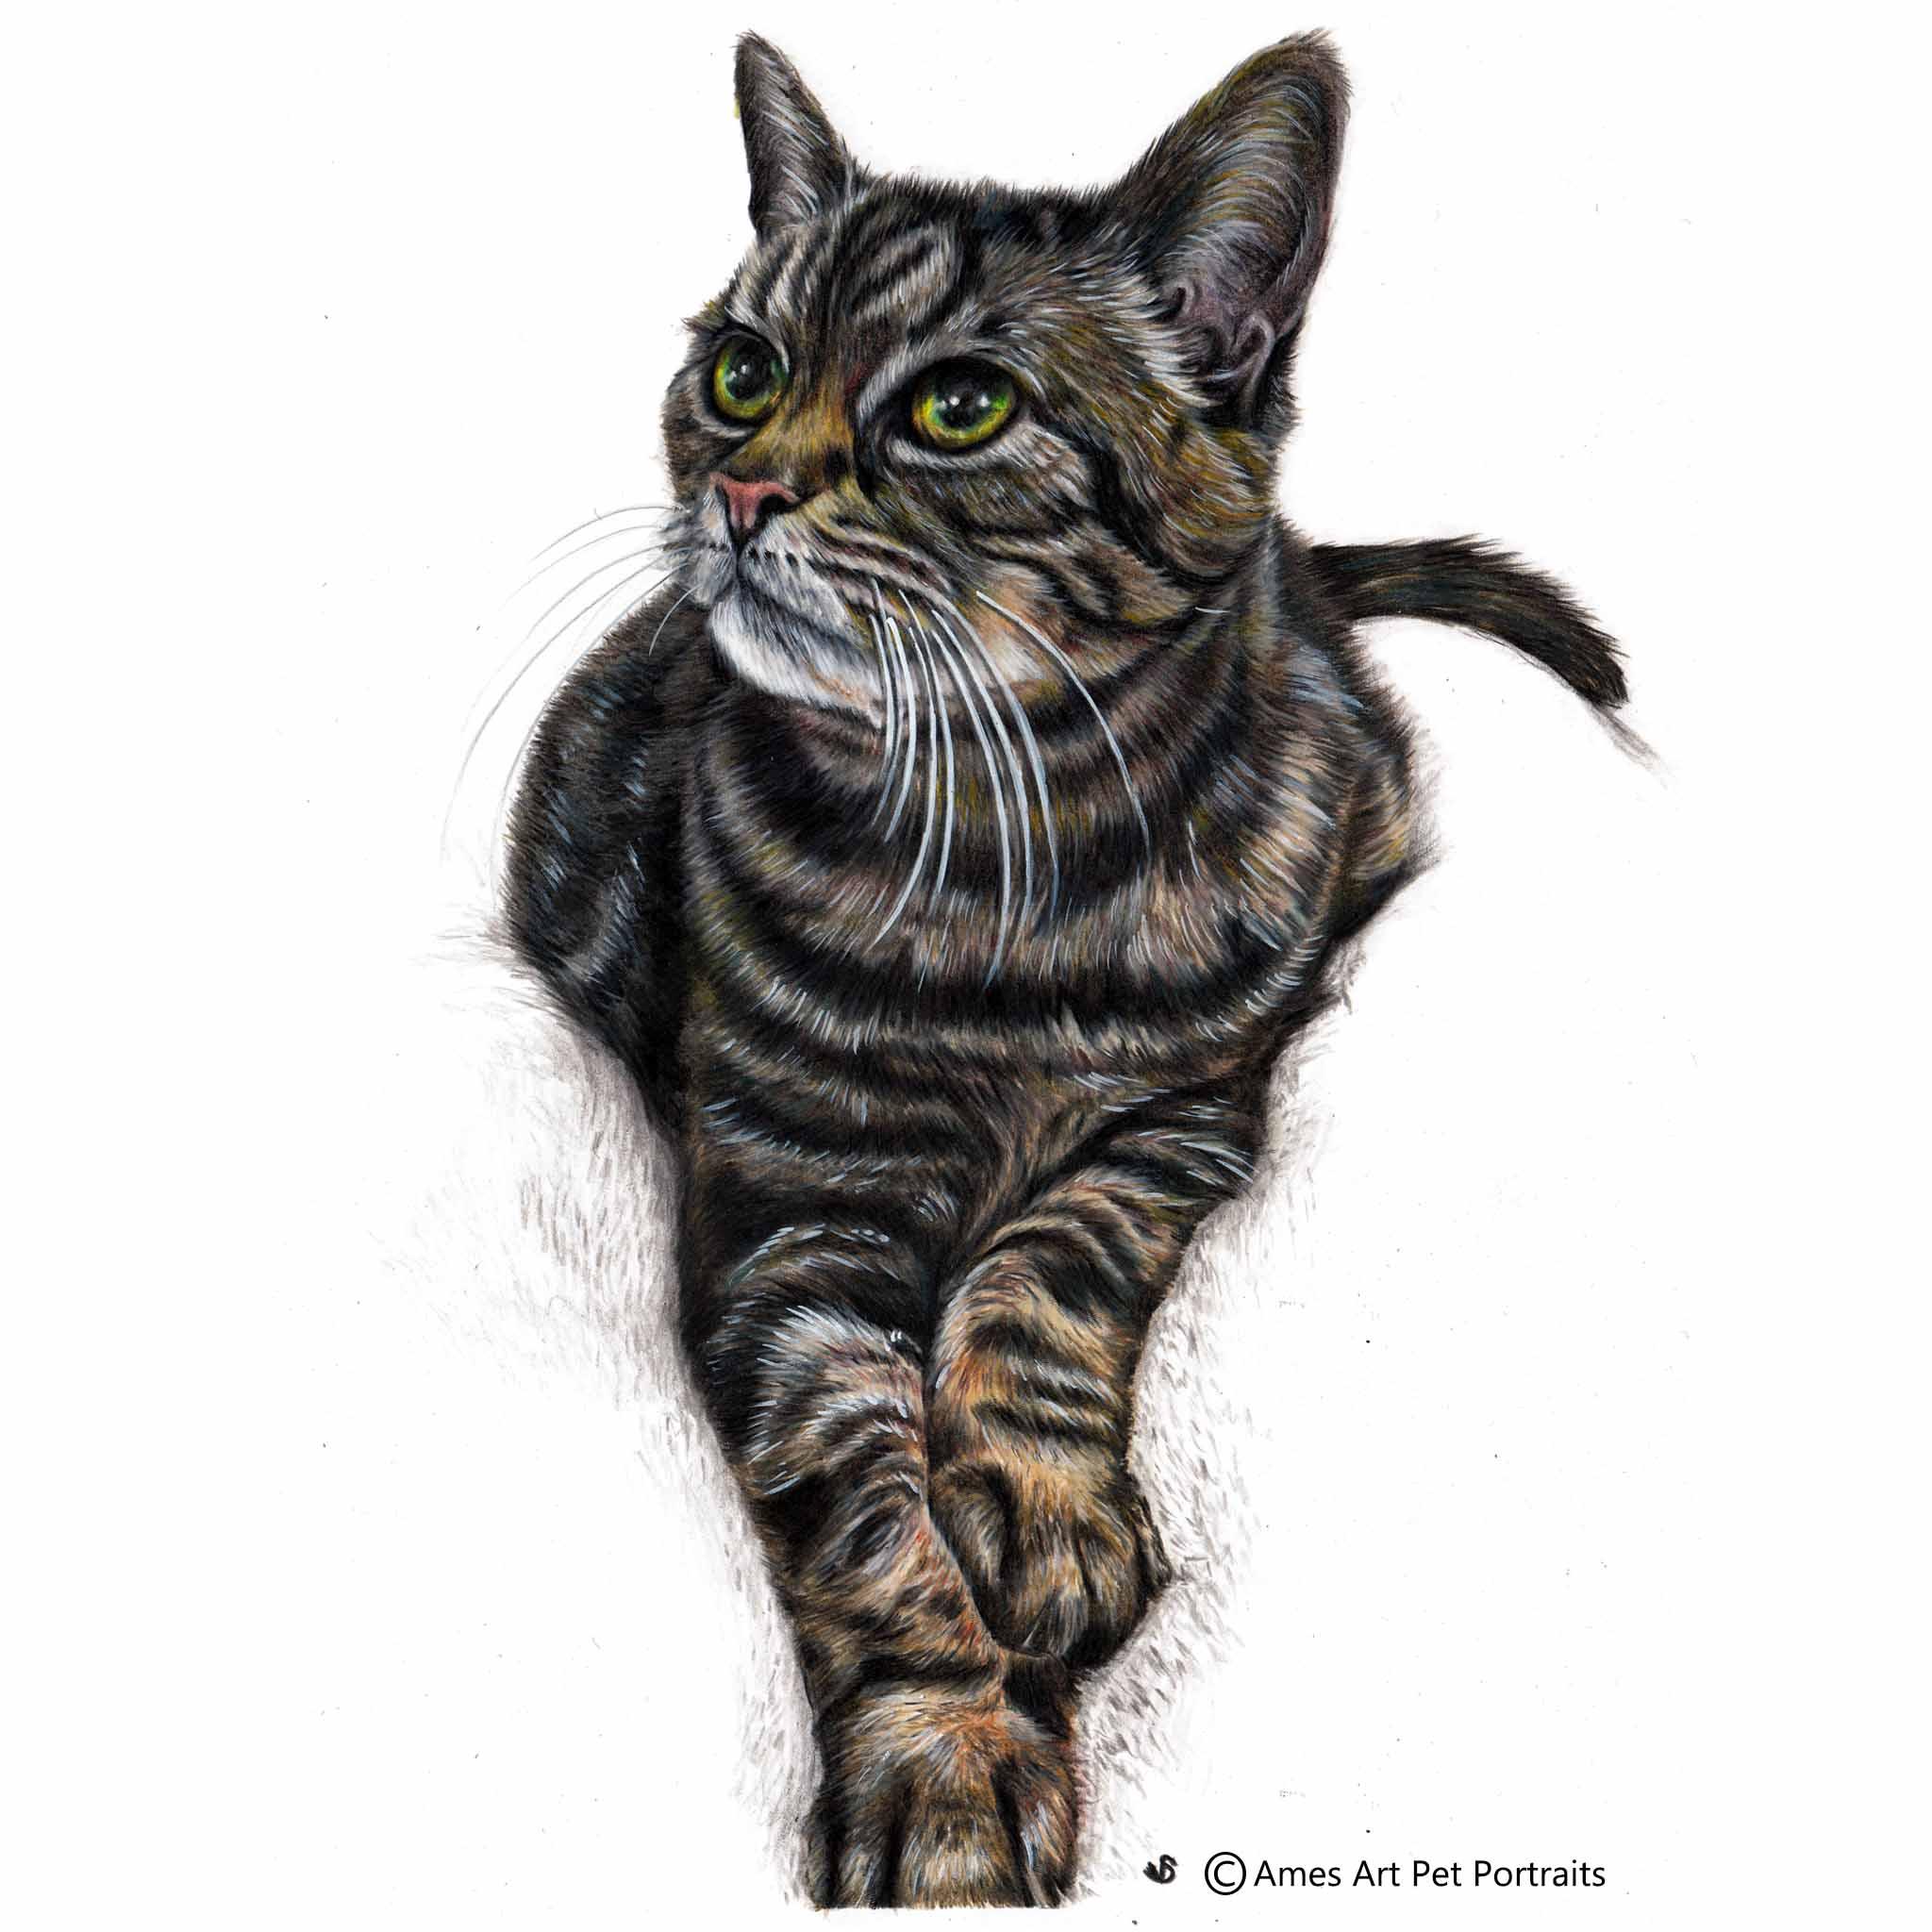 Tabitha Anne - UK,11.7 x 16.5 in, 2017, Colour Pencil Cat Portrait